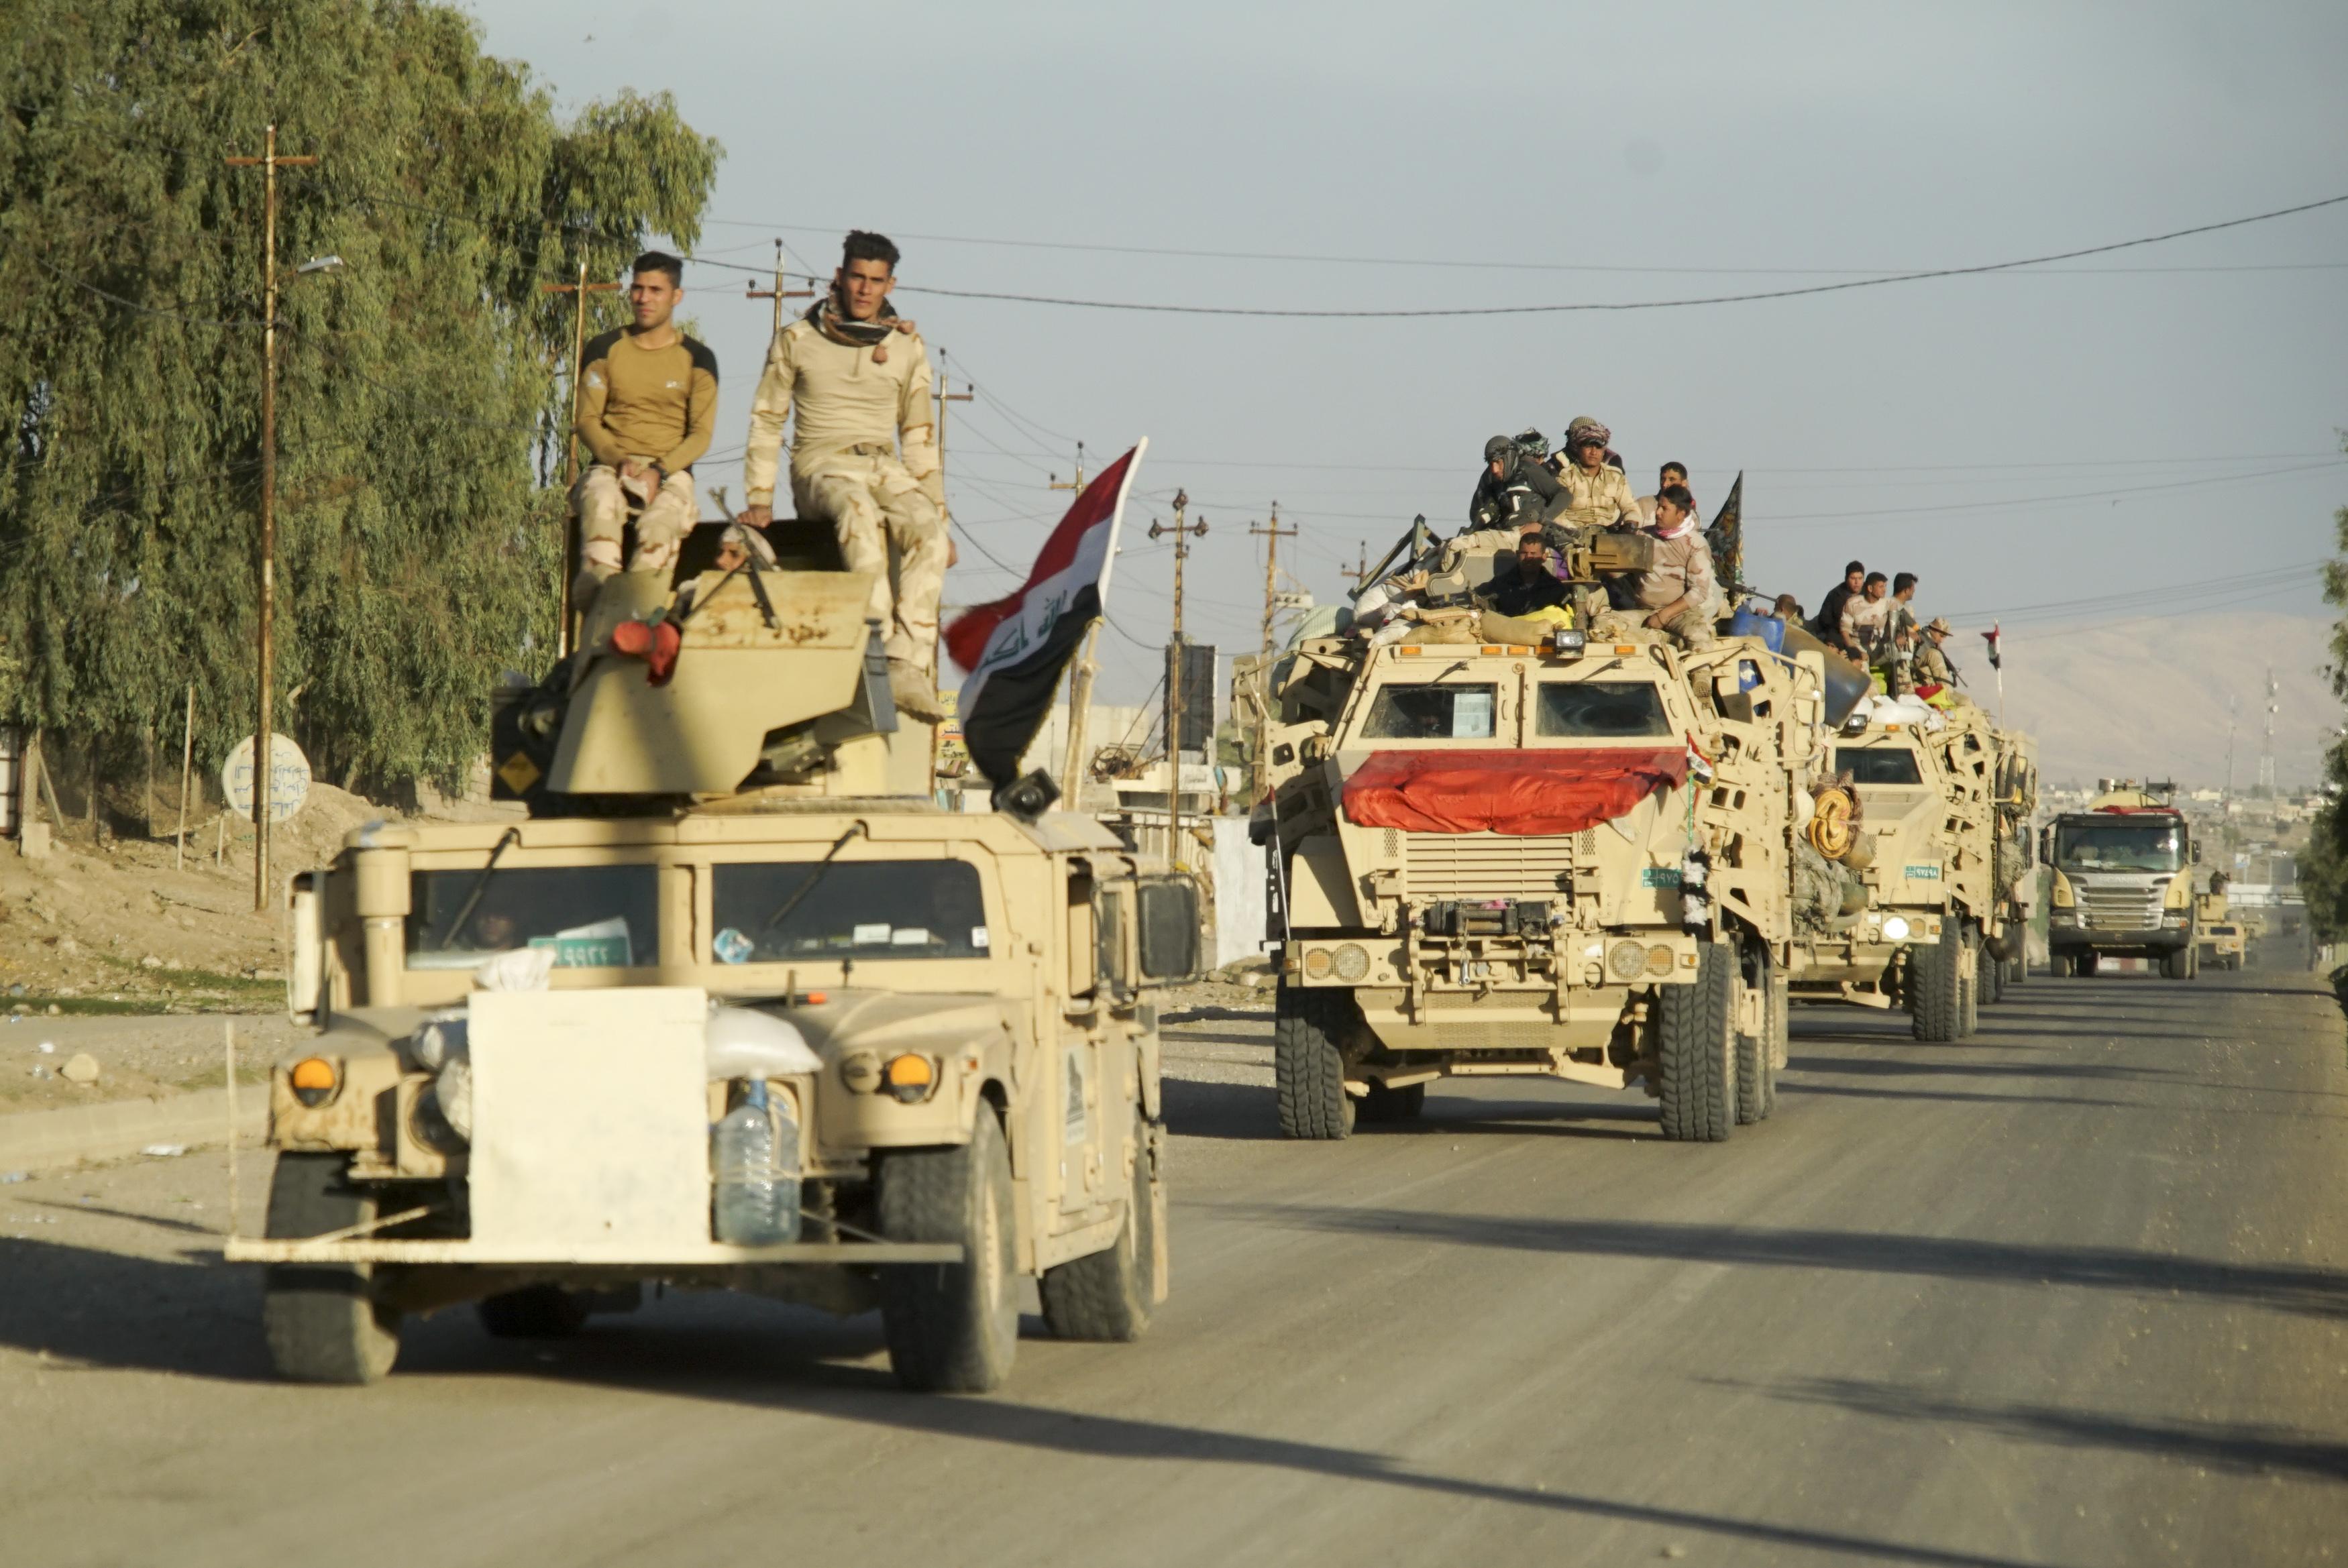 Halliburton force iraqi into sex slavery 2008